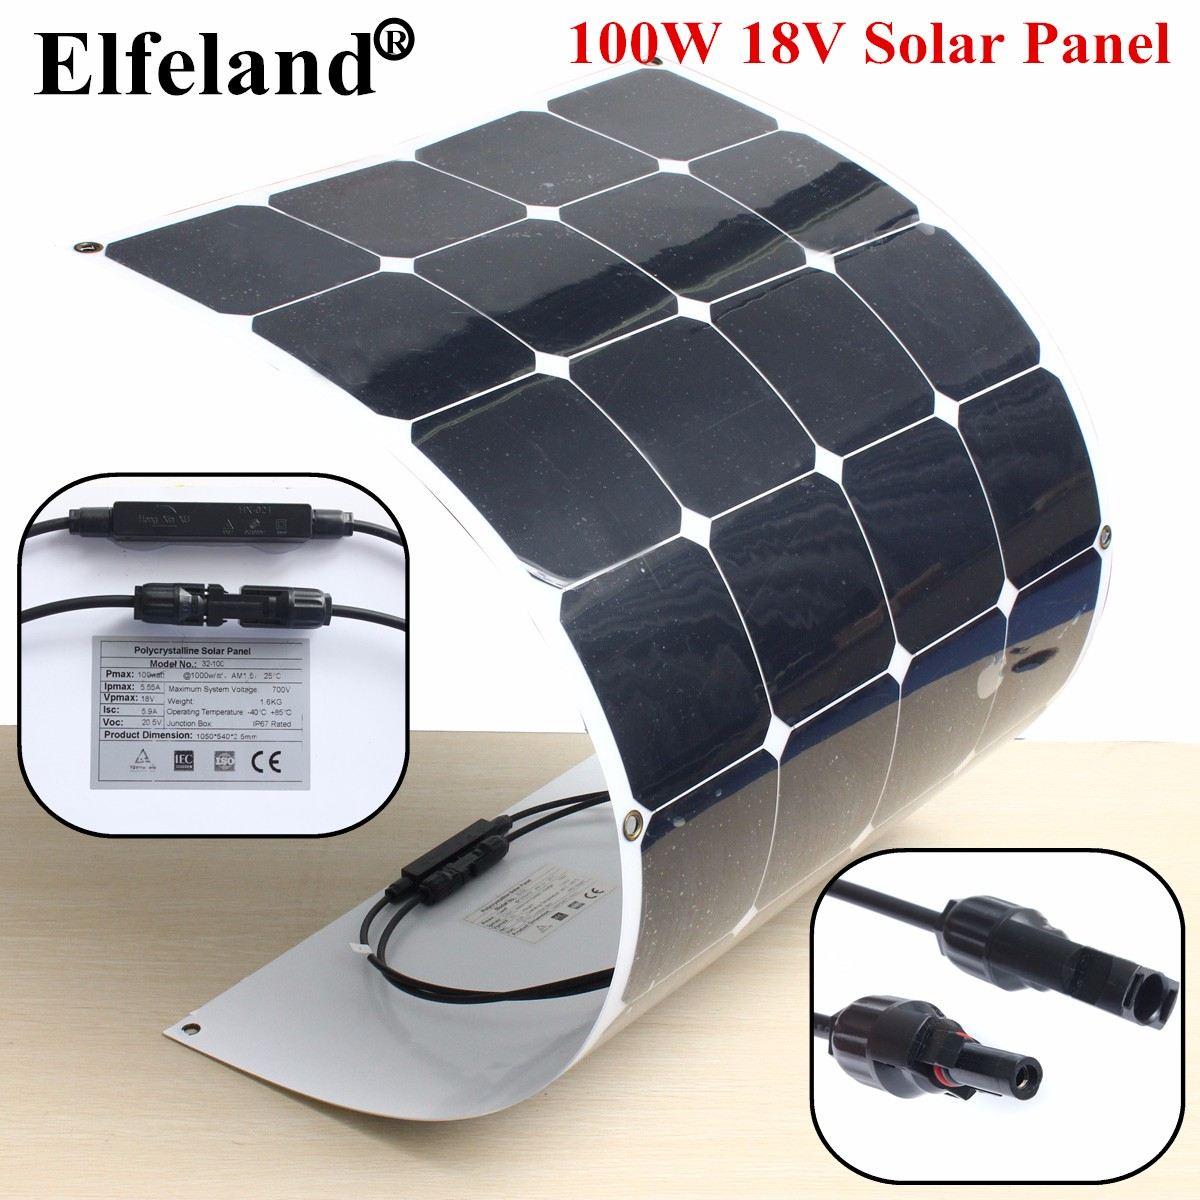 32-10C 100W 18V Semi Flexible Monocrystalline Solar Panel Waterproof High Conversion Efficiency For RV Boat Car + 1.5m Cable